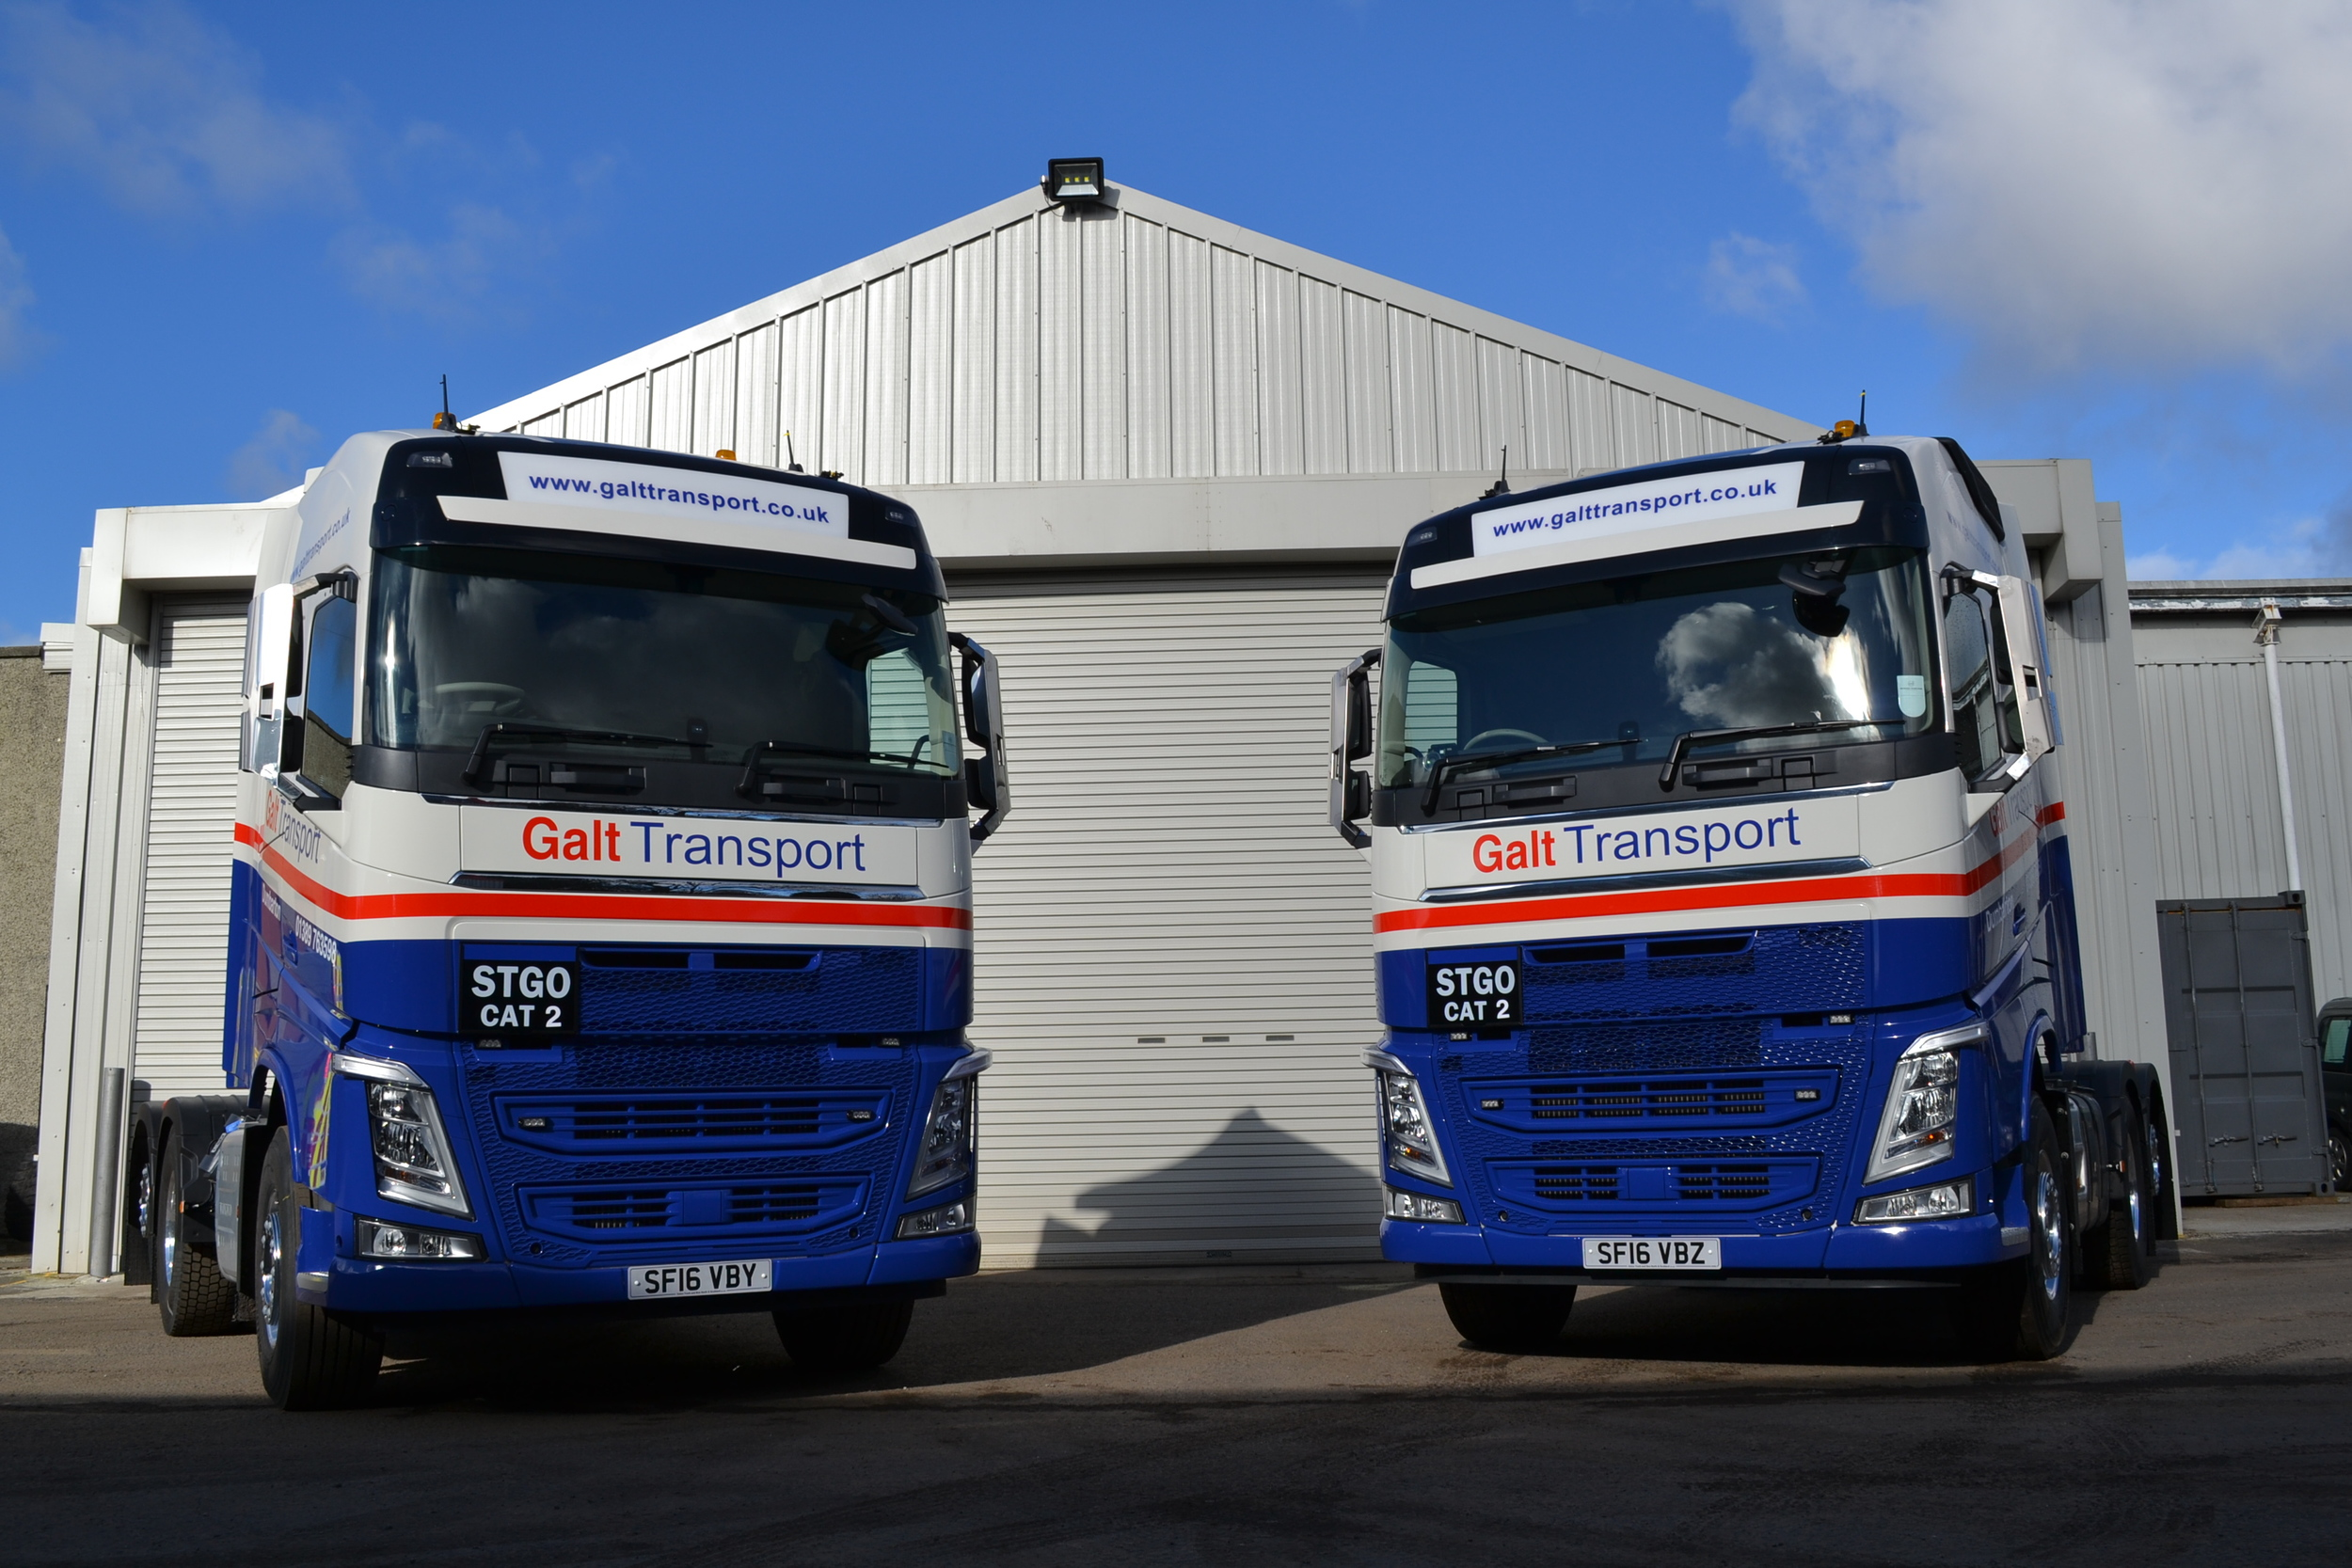 Two new Volvo FH12 trucks added to Galt's fleet